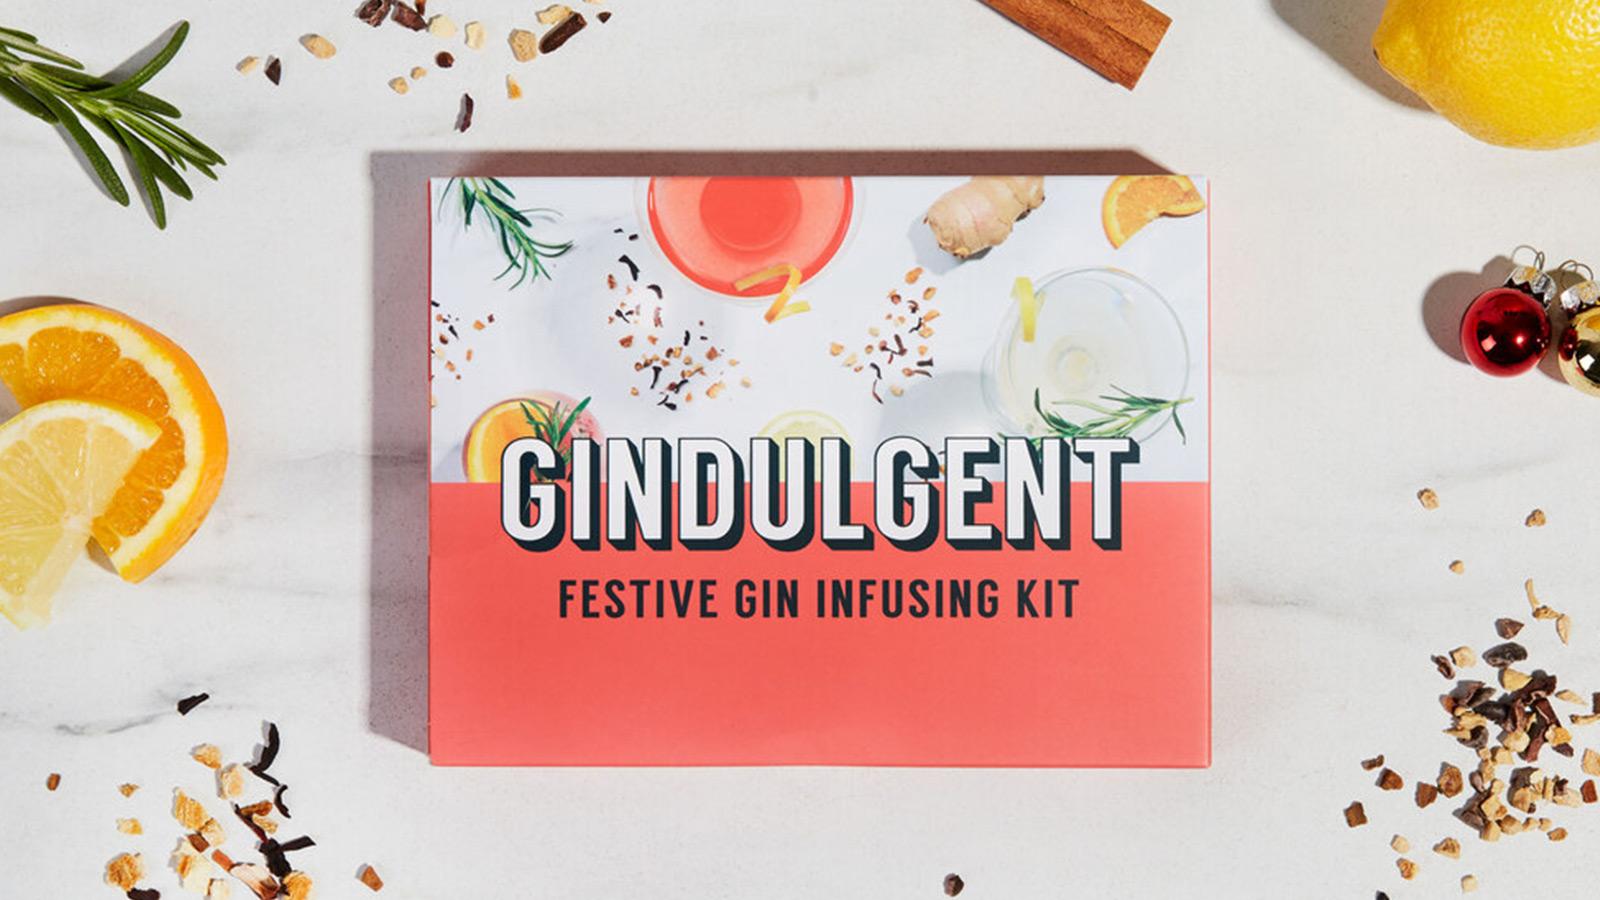 Festive Gindulgent Gin Infusing Kit